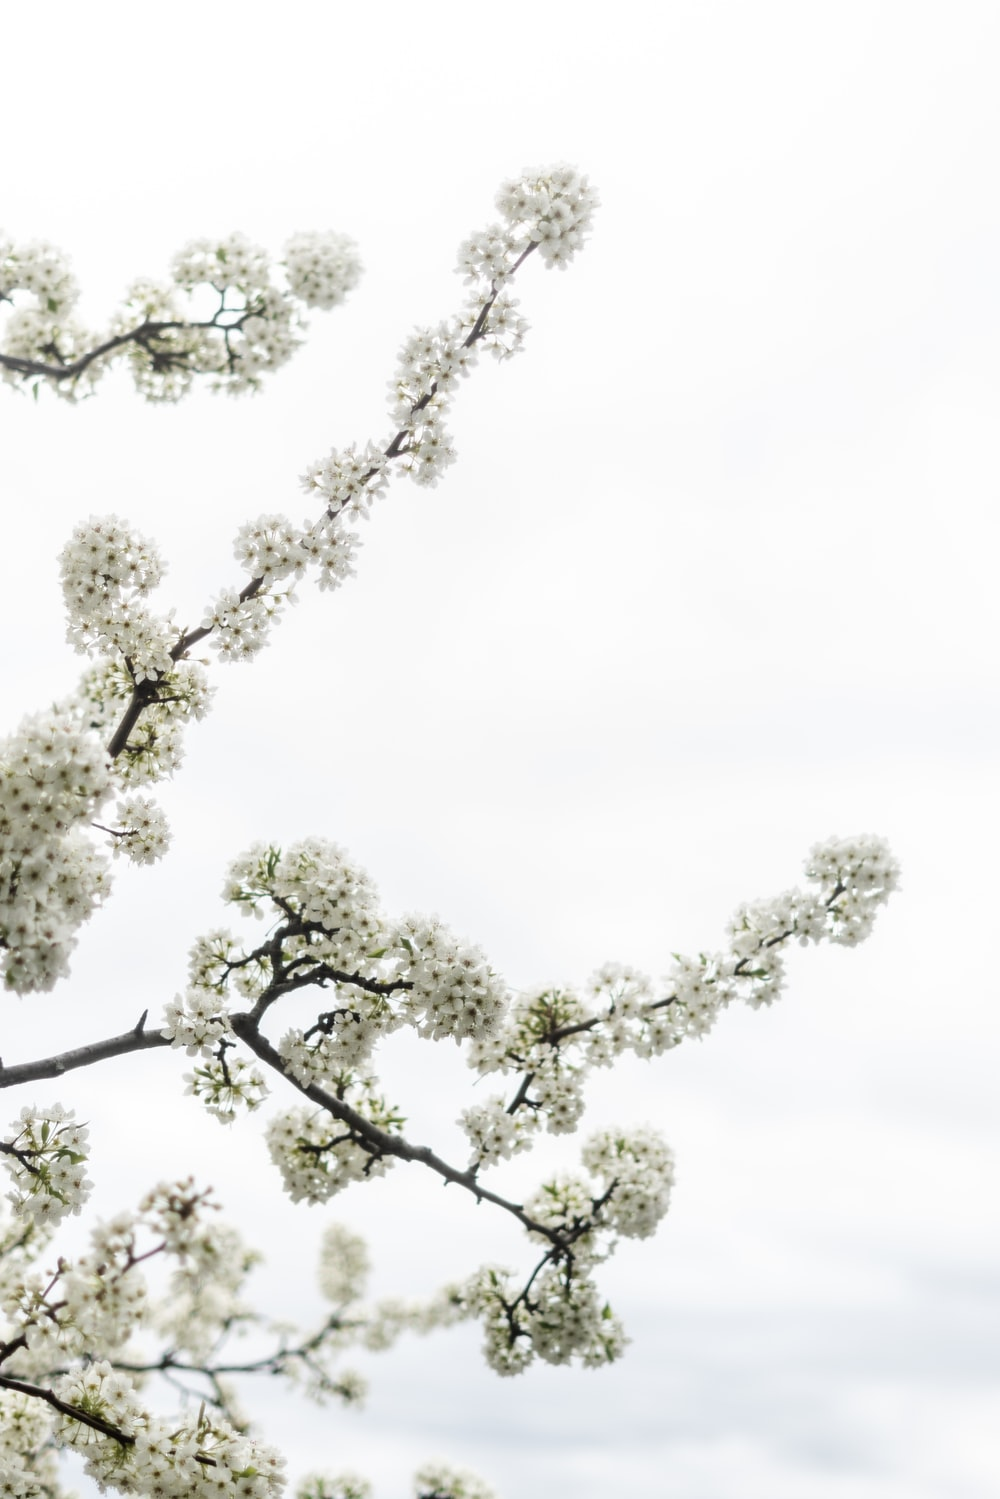 green tree under white sky during daytime